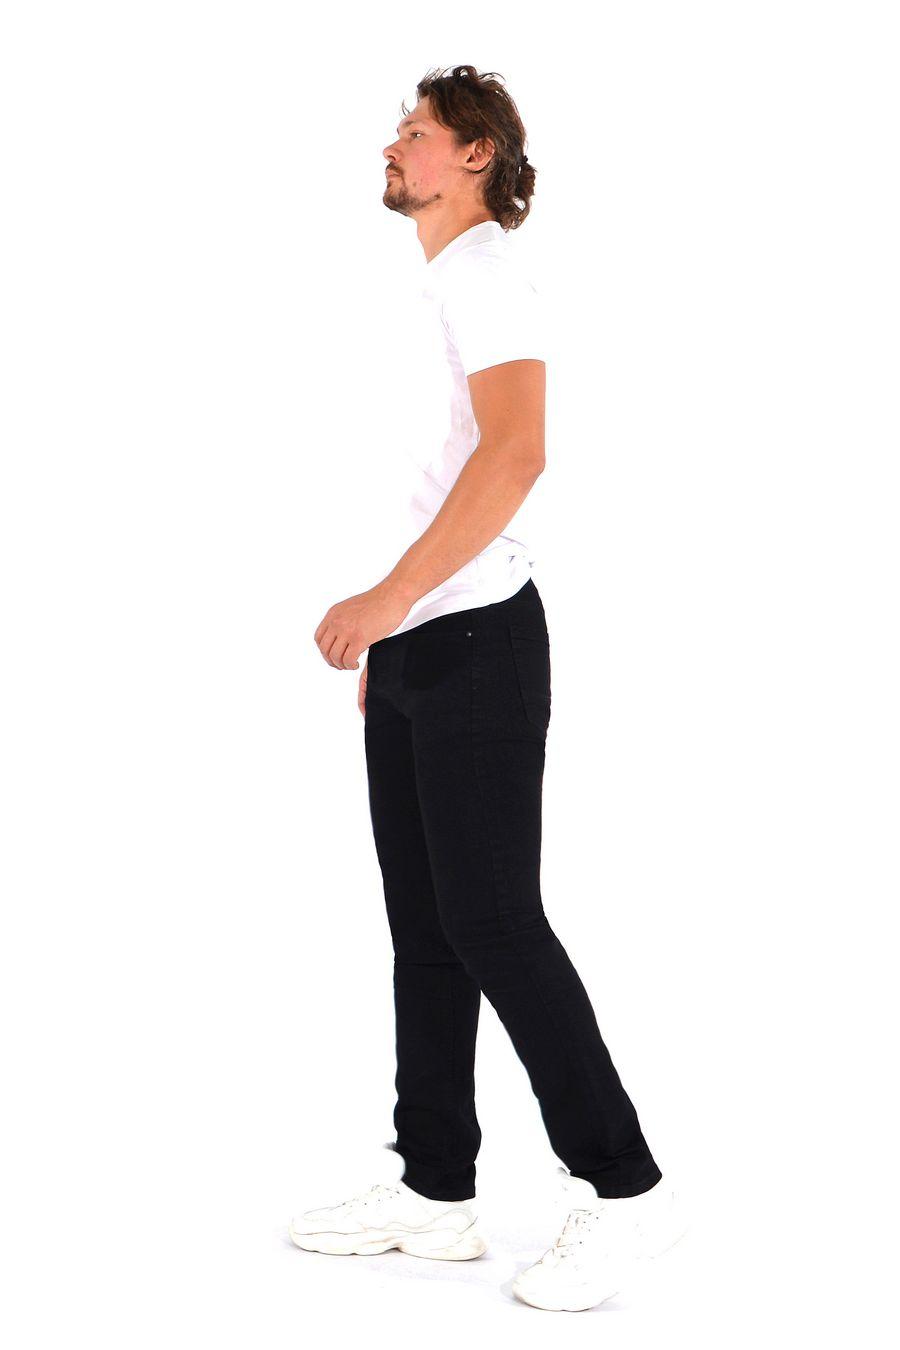 Джинсы мужские Luxury Vision 6030 - фото 2